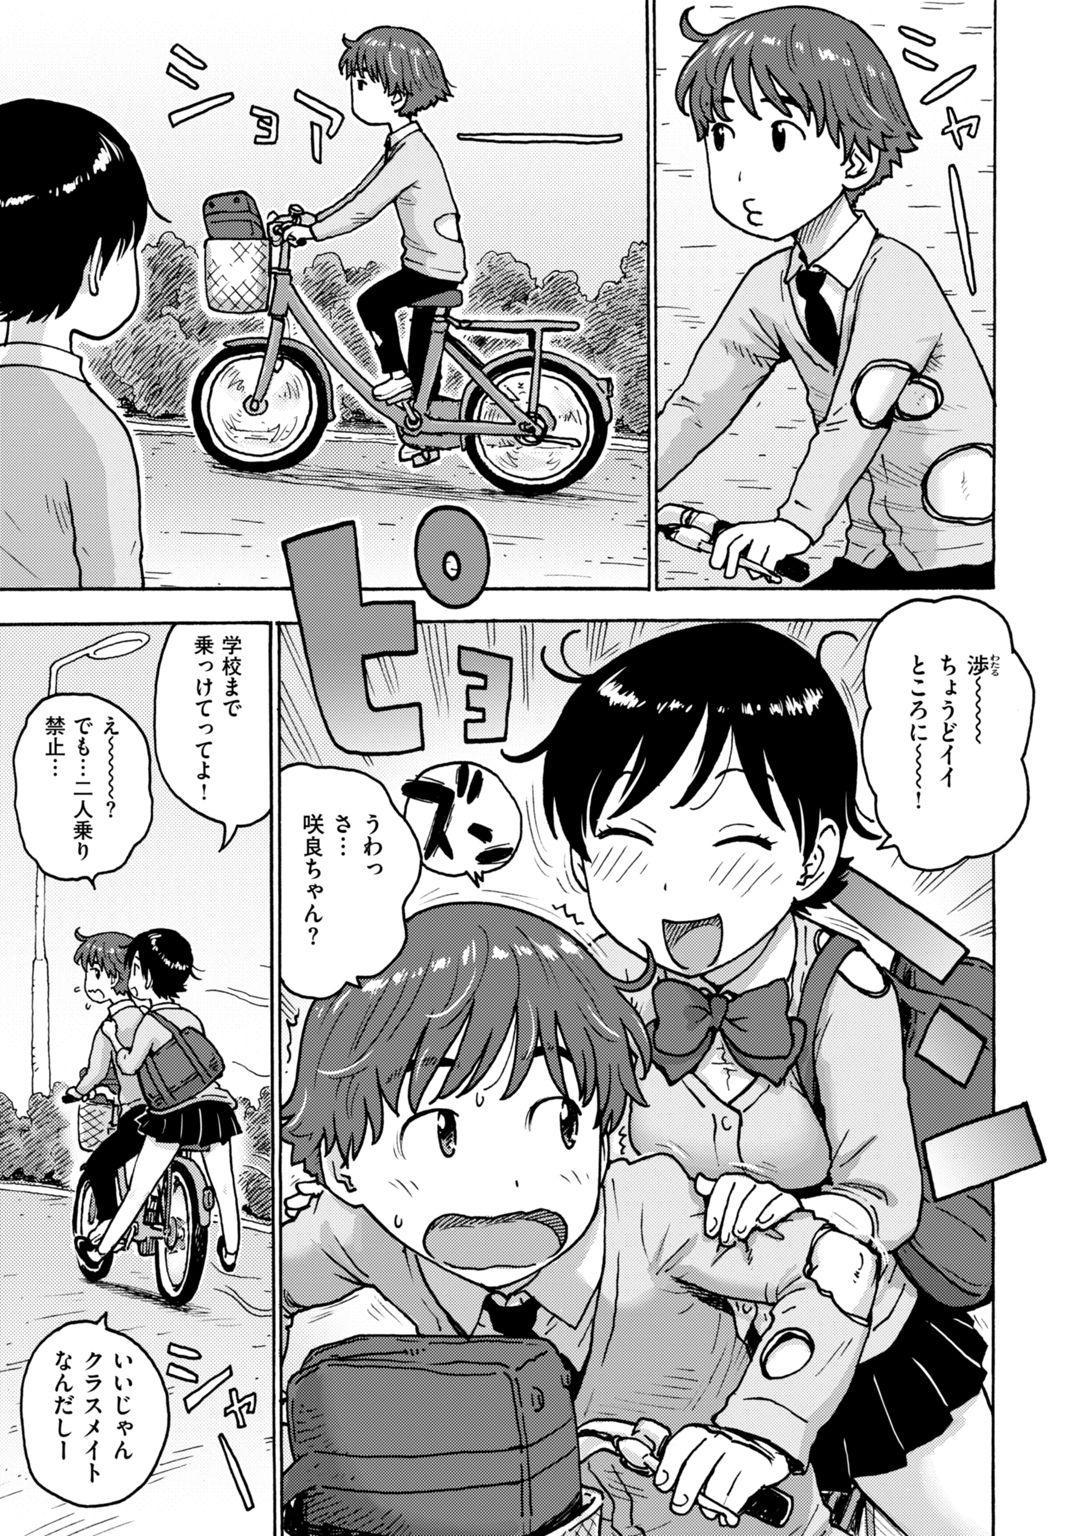 COMIC HAPPINING Vol. 2 71